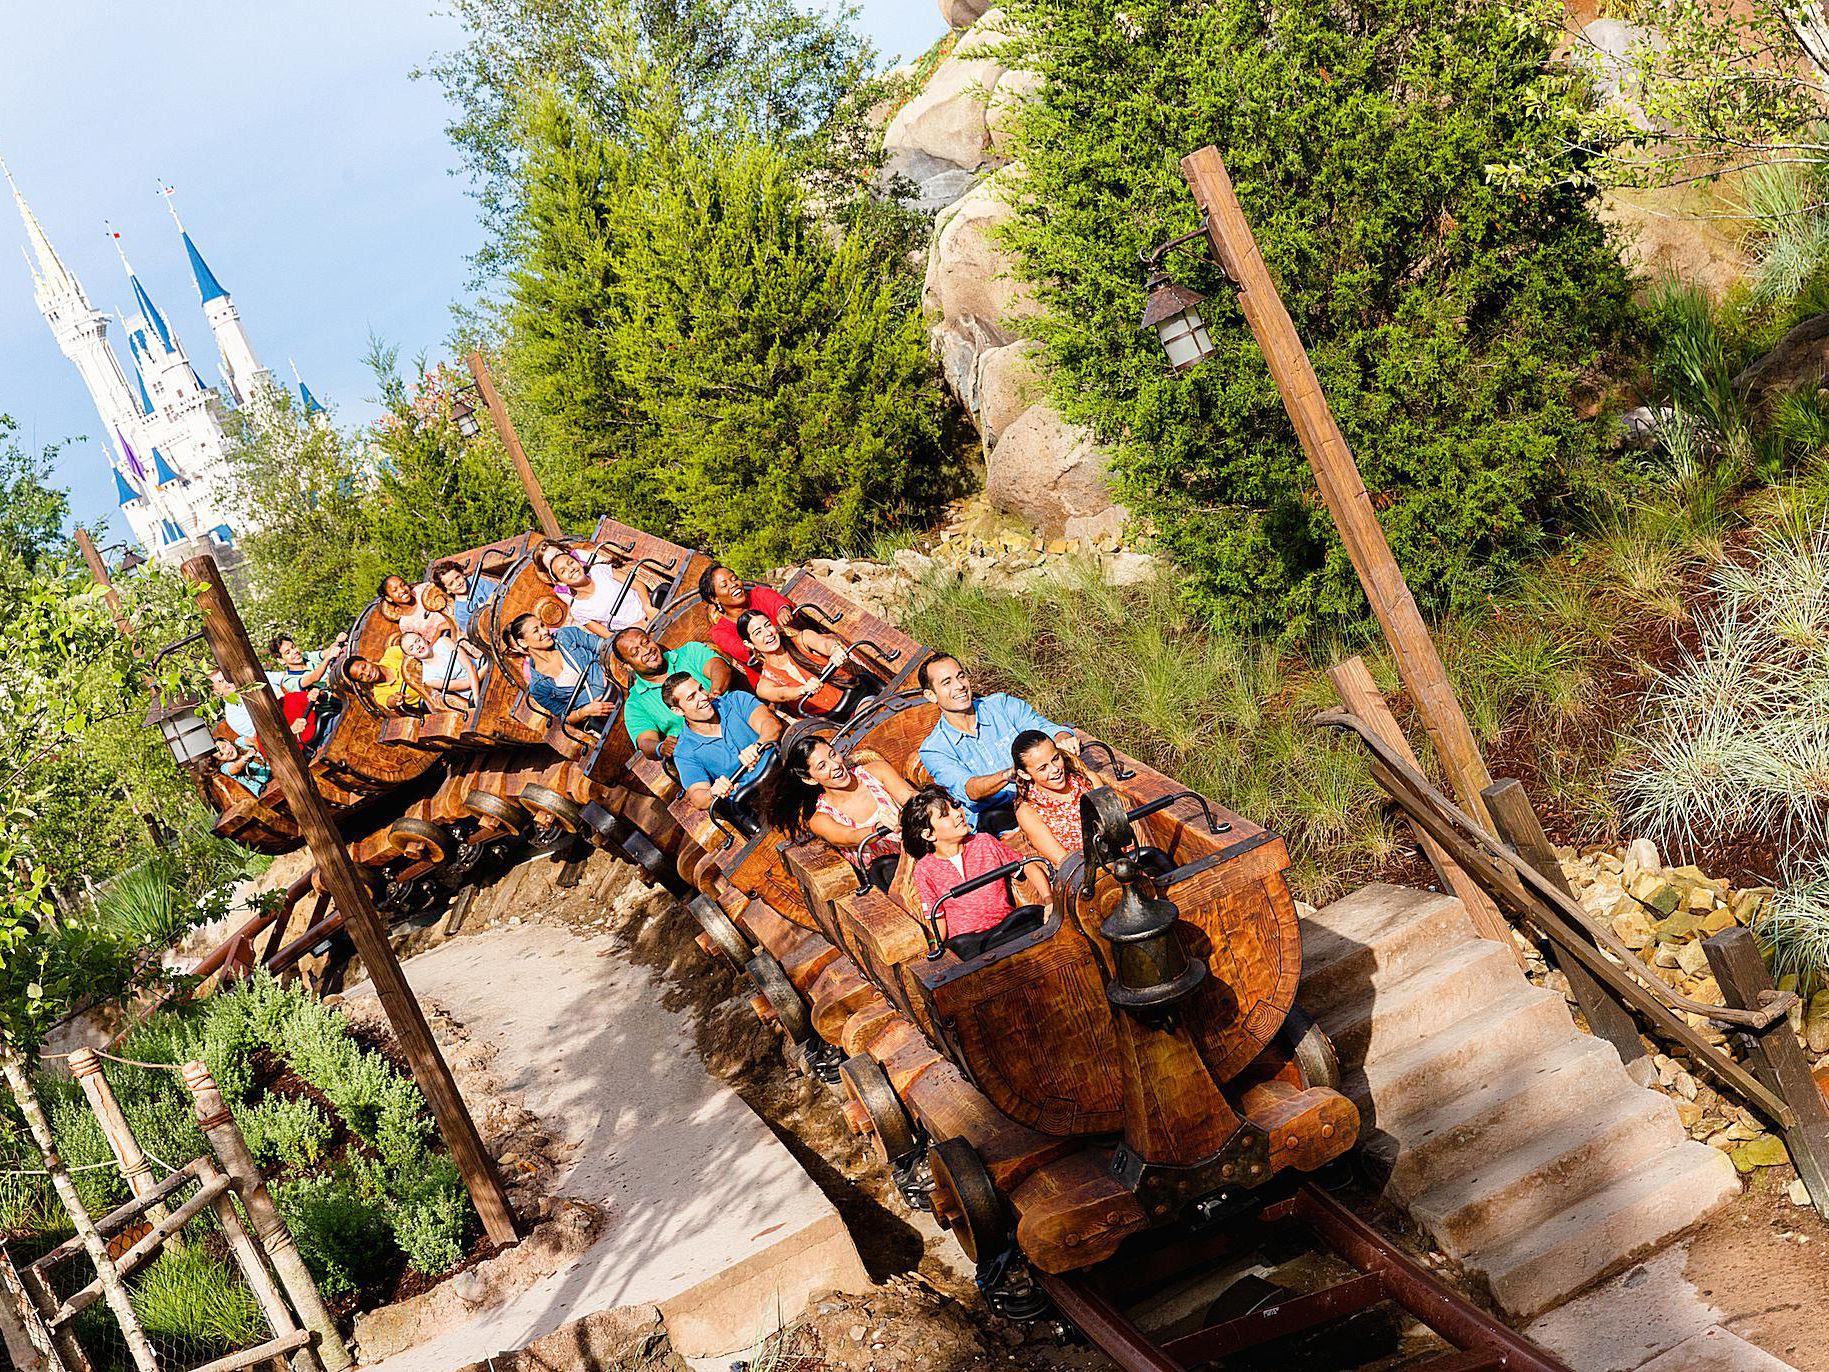 Seven Dwarfs Mine Train Ride Review